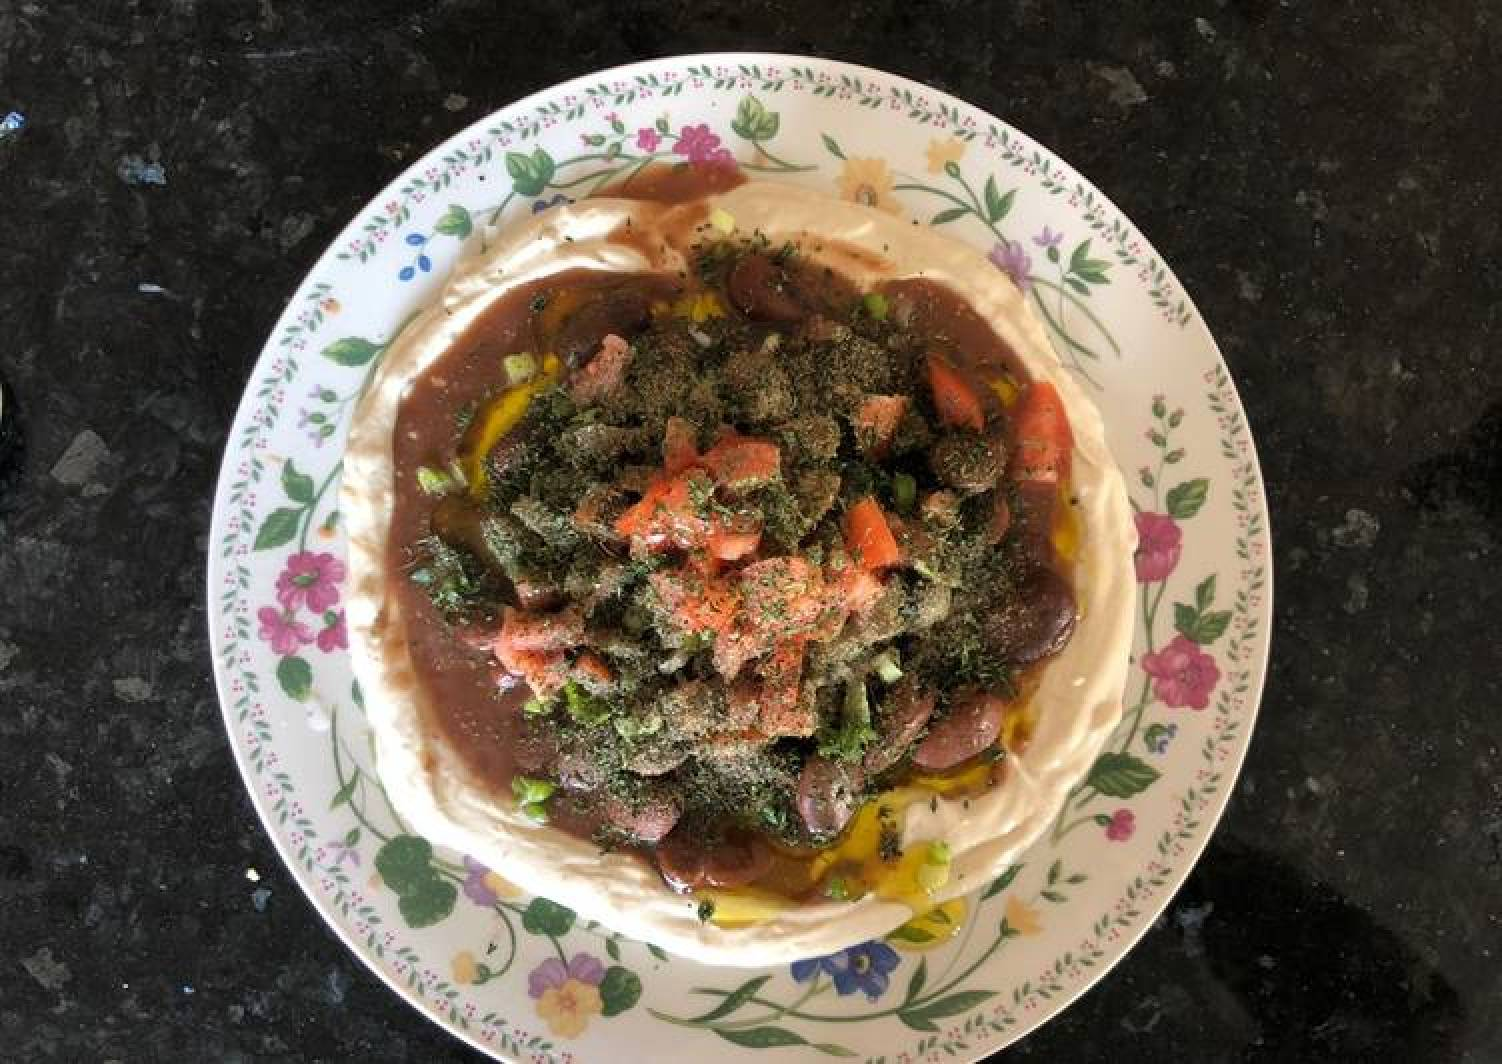 Fava beans salad